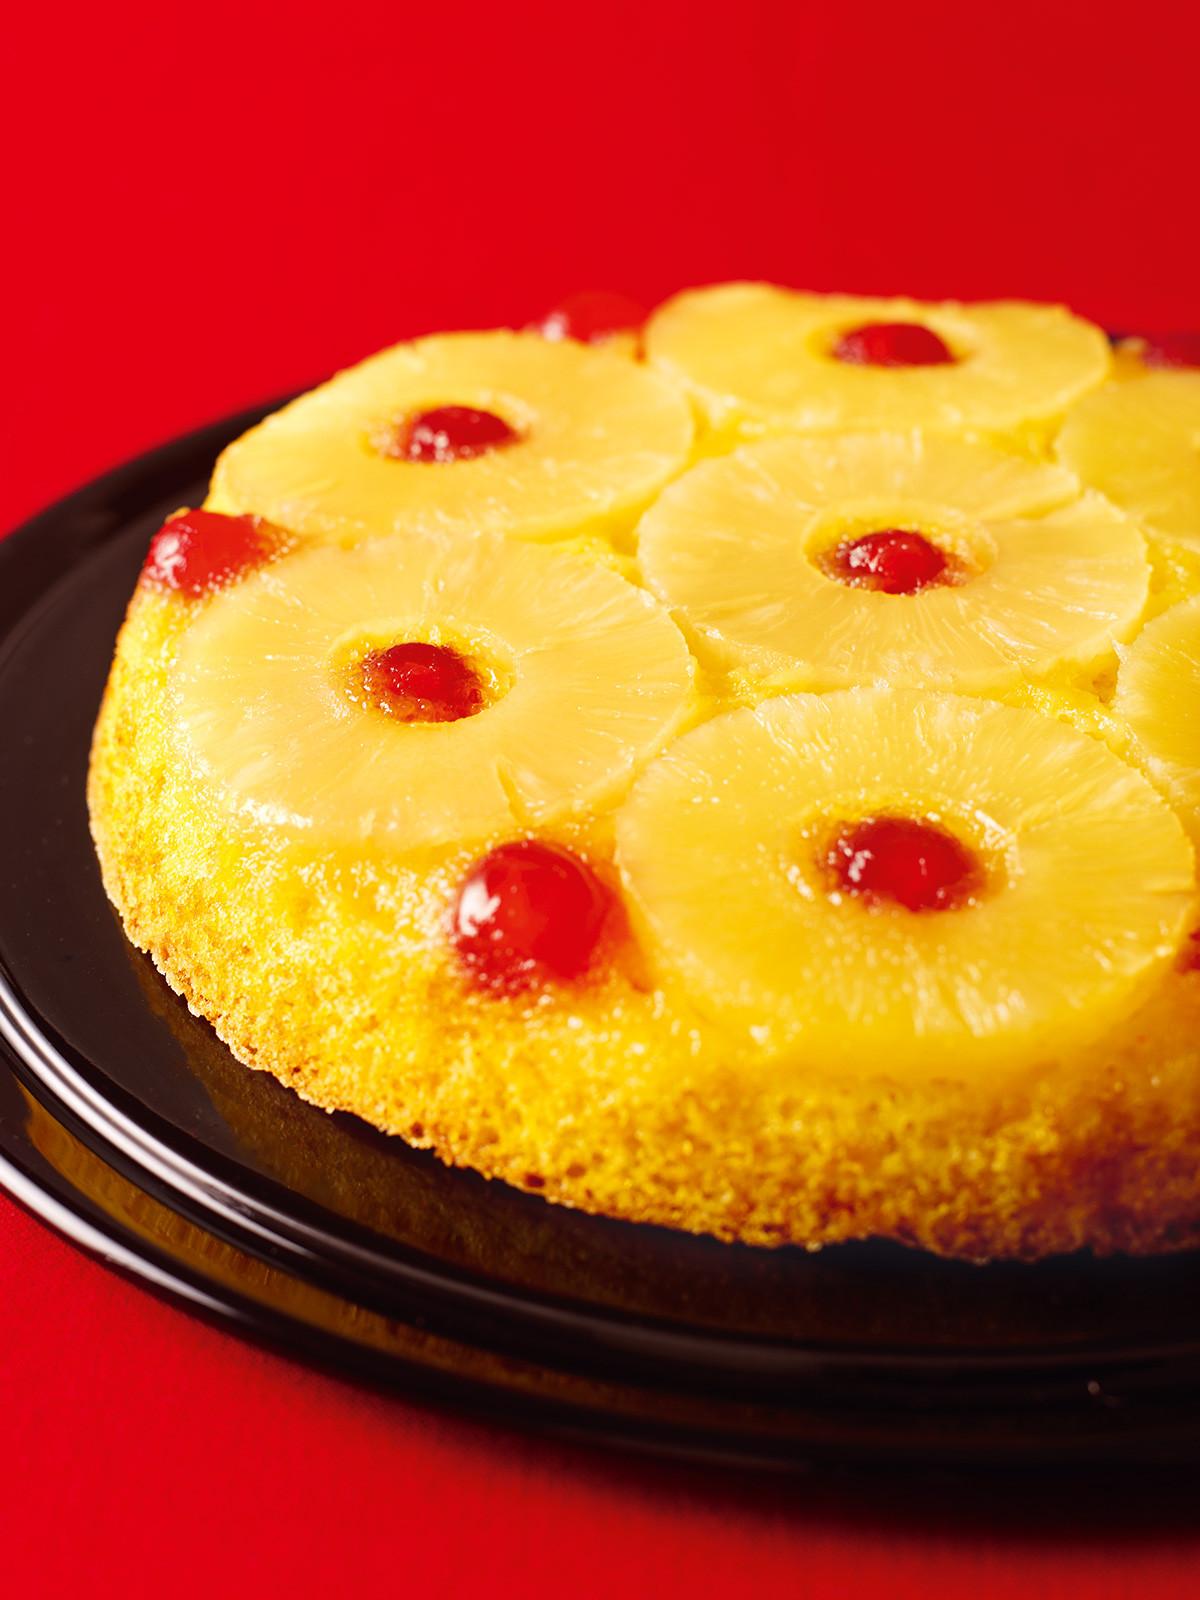 Pineapple Upside Cake  Pineapple Upside Down Cake Nigella s Recipes